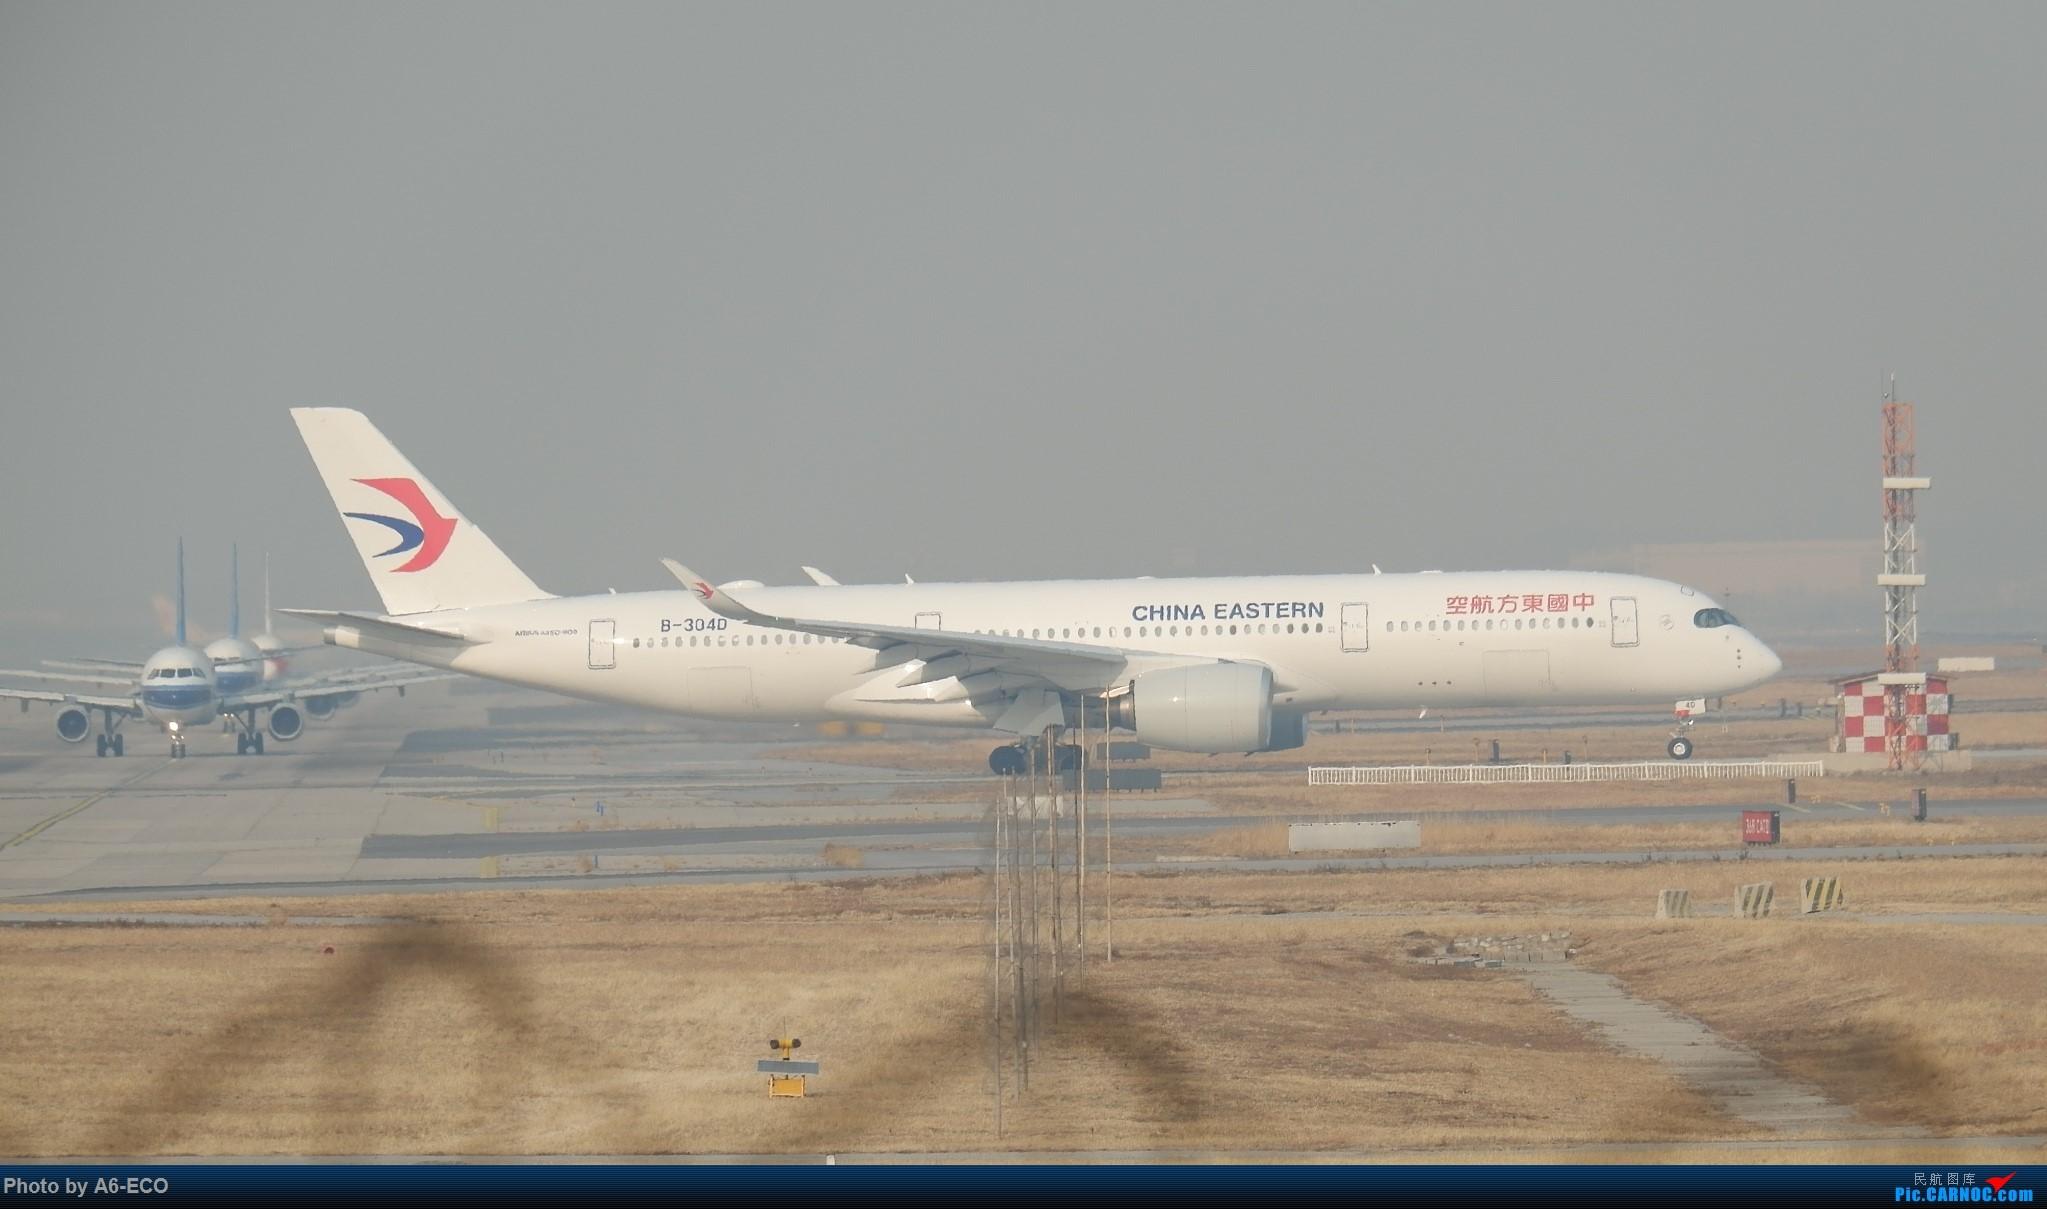 [原创]Re:[原创]【一图党】China Eastern Airlines B-304D AIRBUS A350-900 B-304D 中国北京首都国际机场